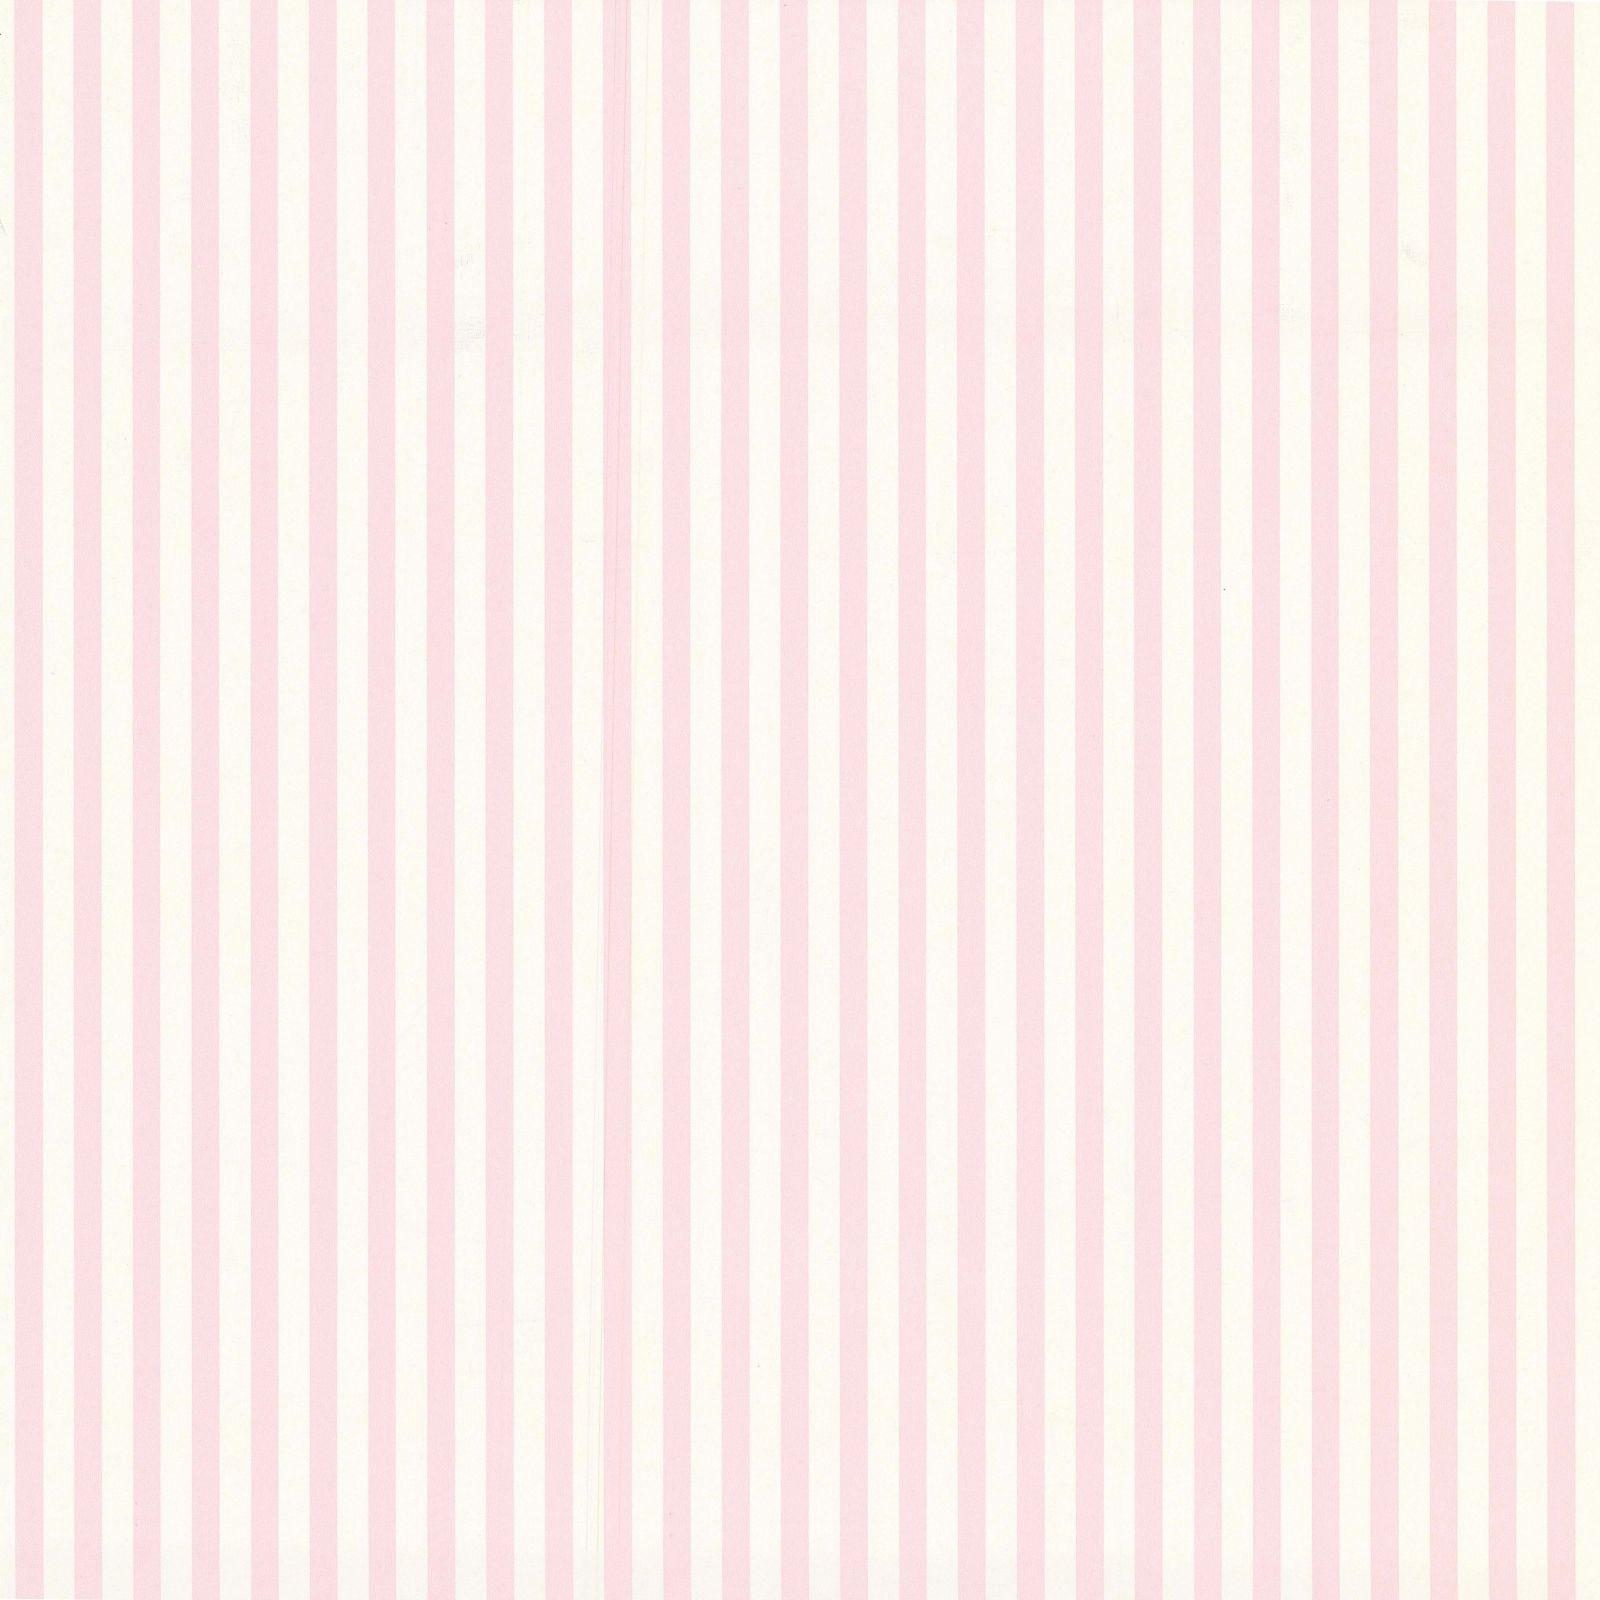 papier peint rayures roses et blanches tartine et chocolat chambre b b pinterest. Black Bedroom Furniture Sets. Home Design Ideas